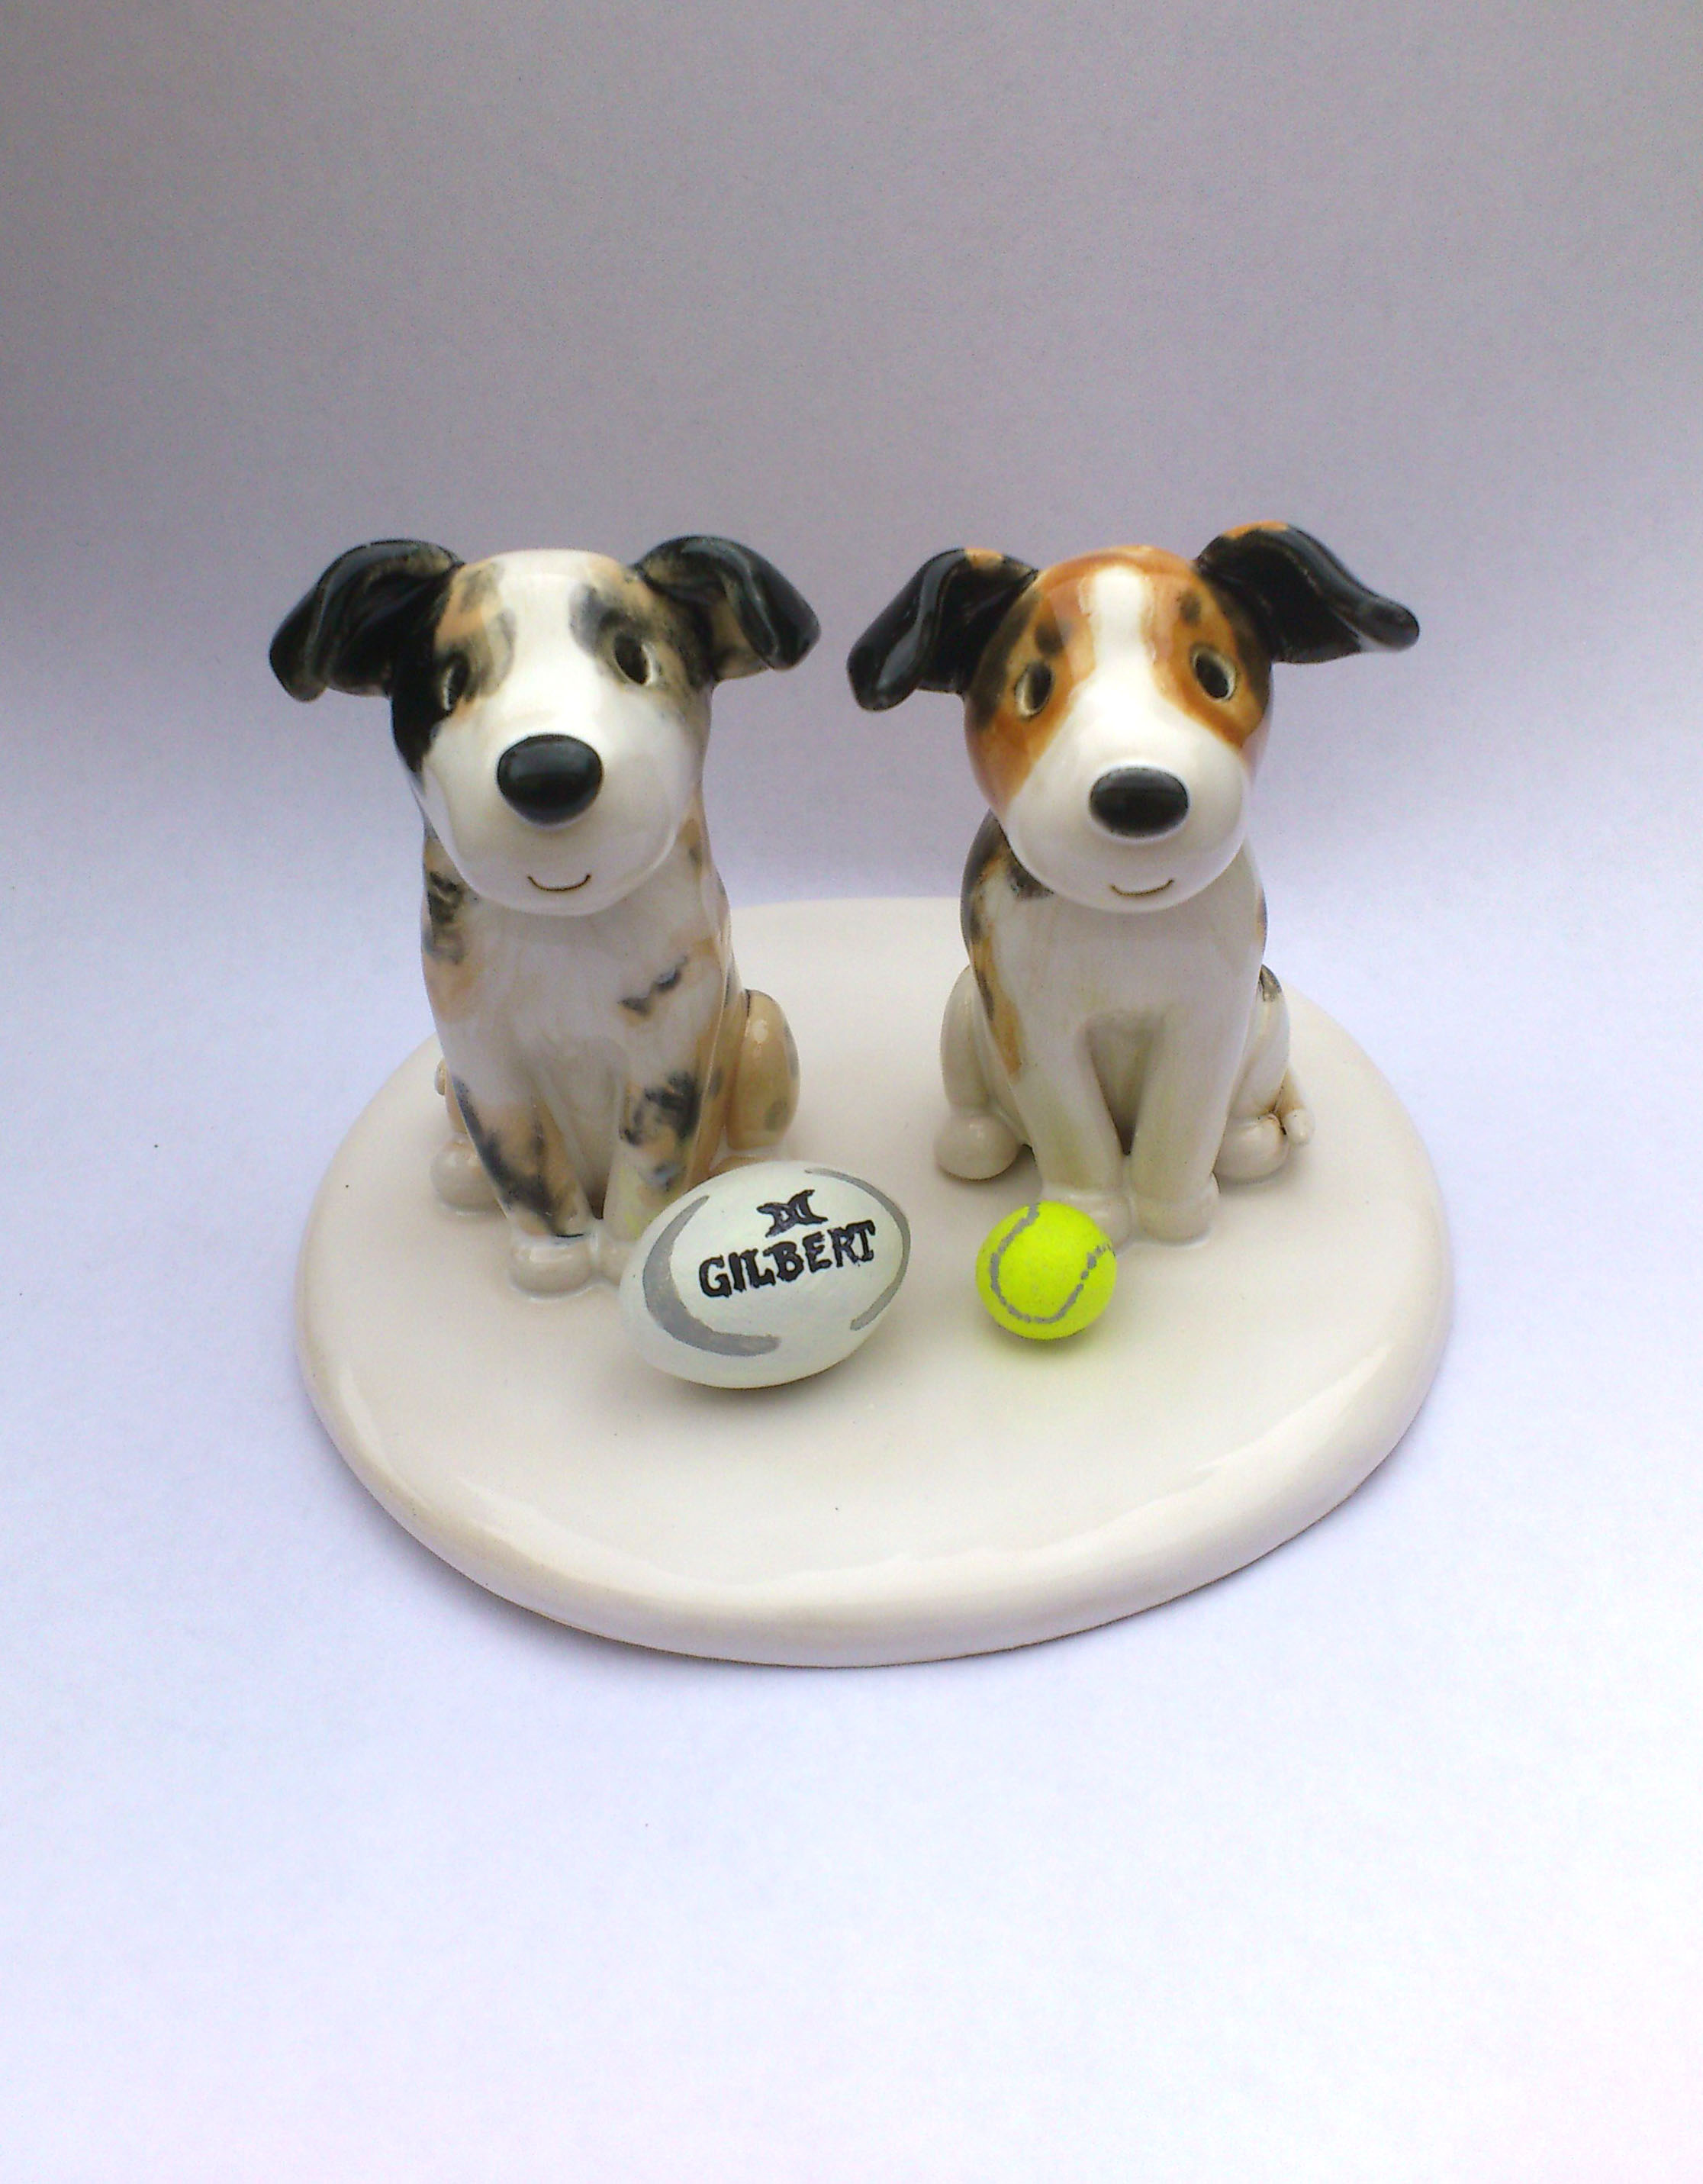 Ceramic Animal Wedding Cake Toppers